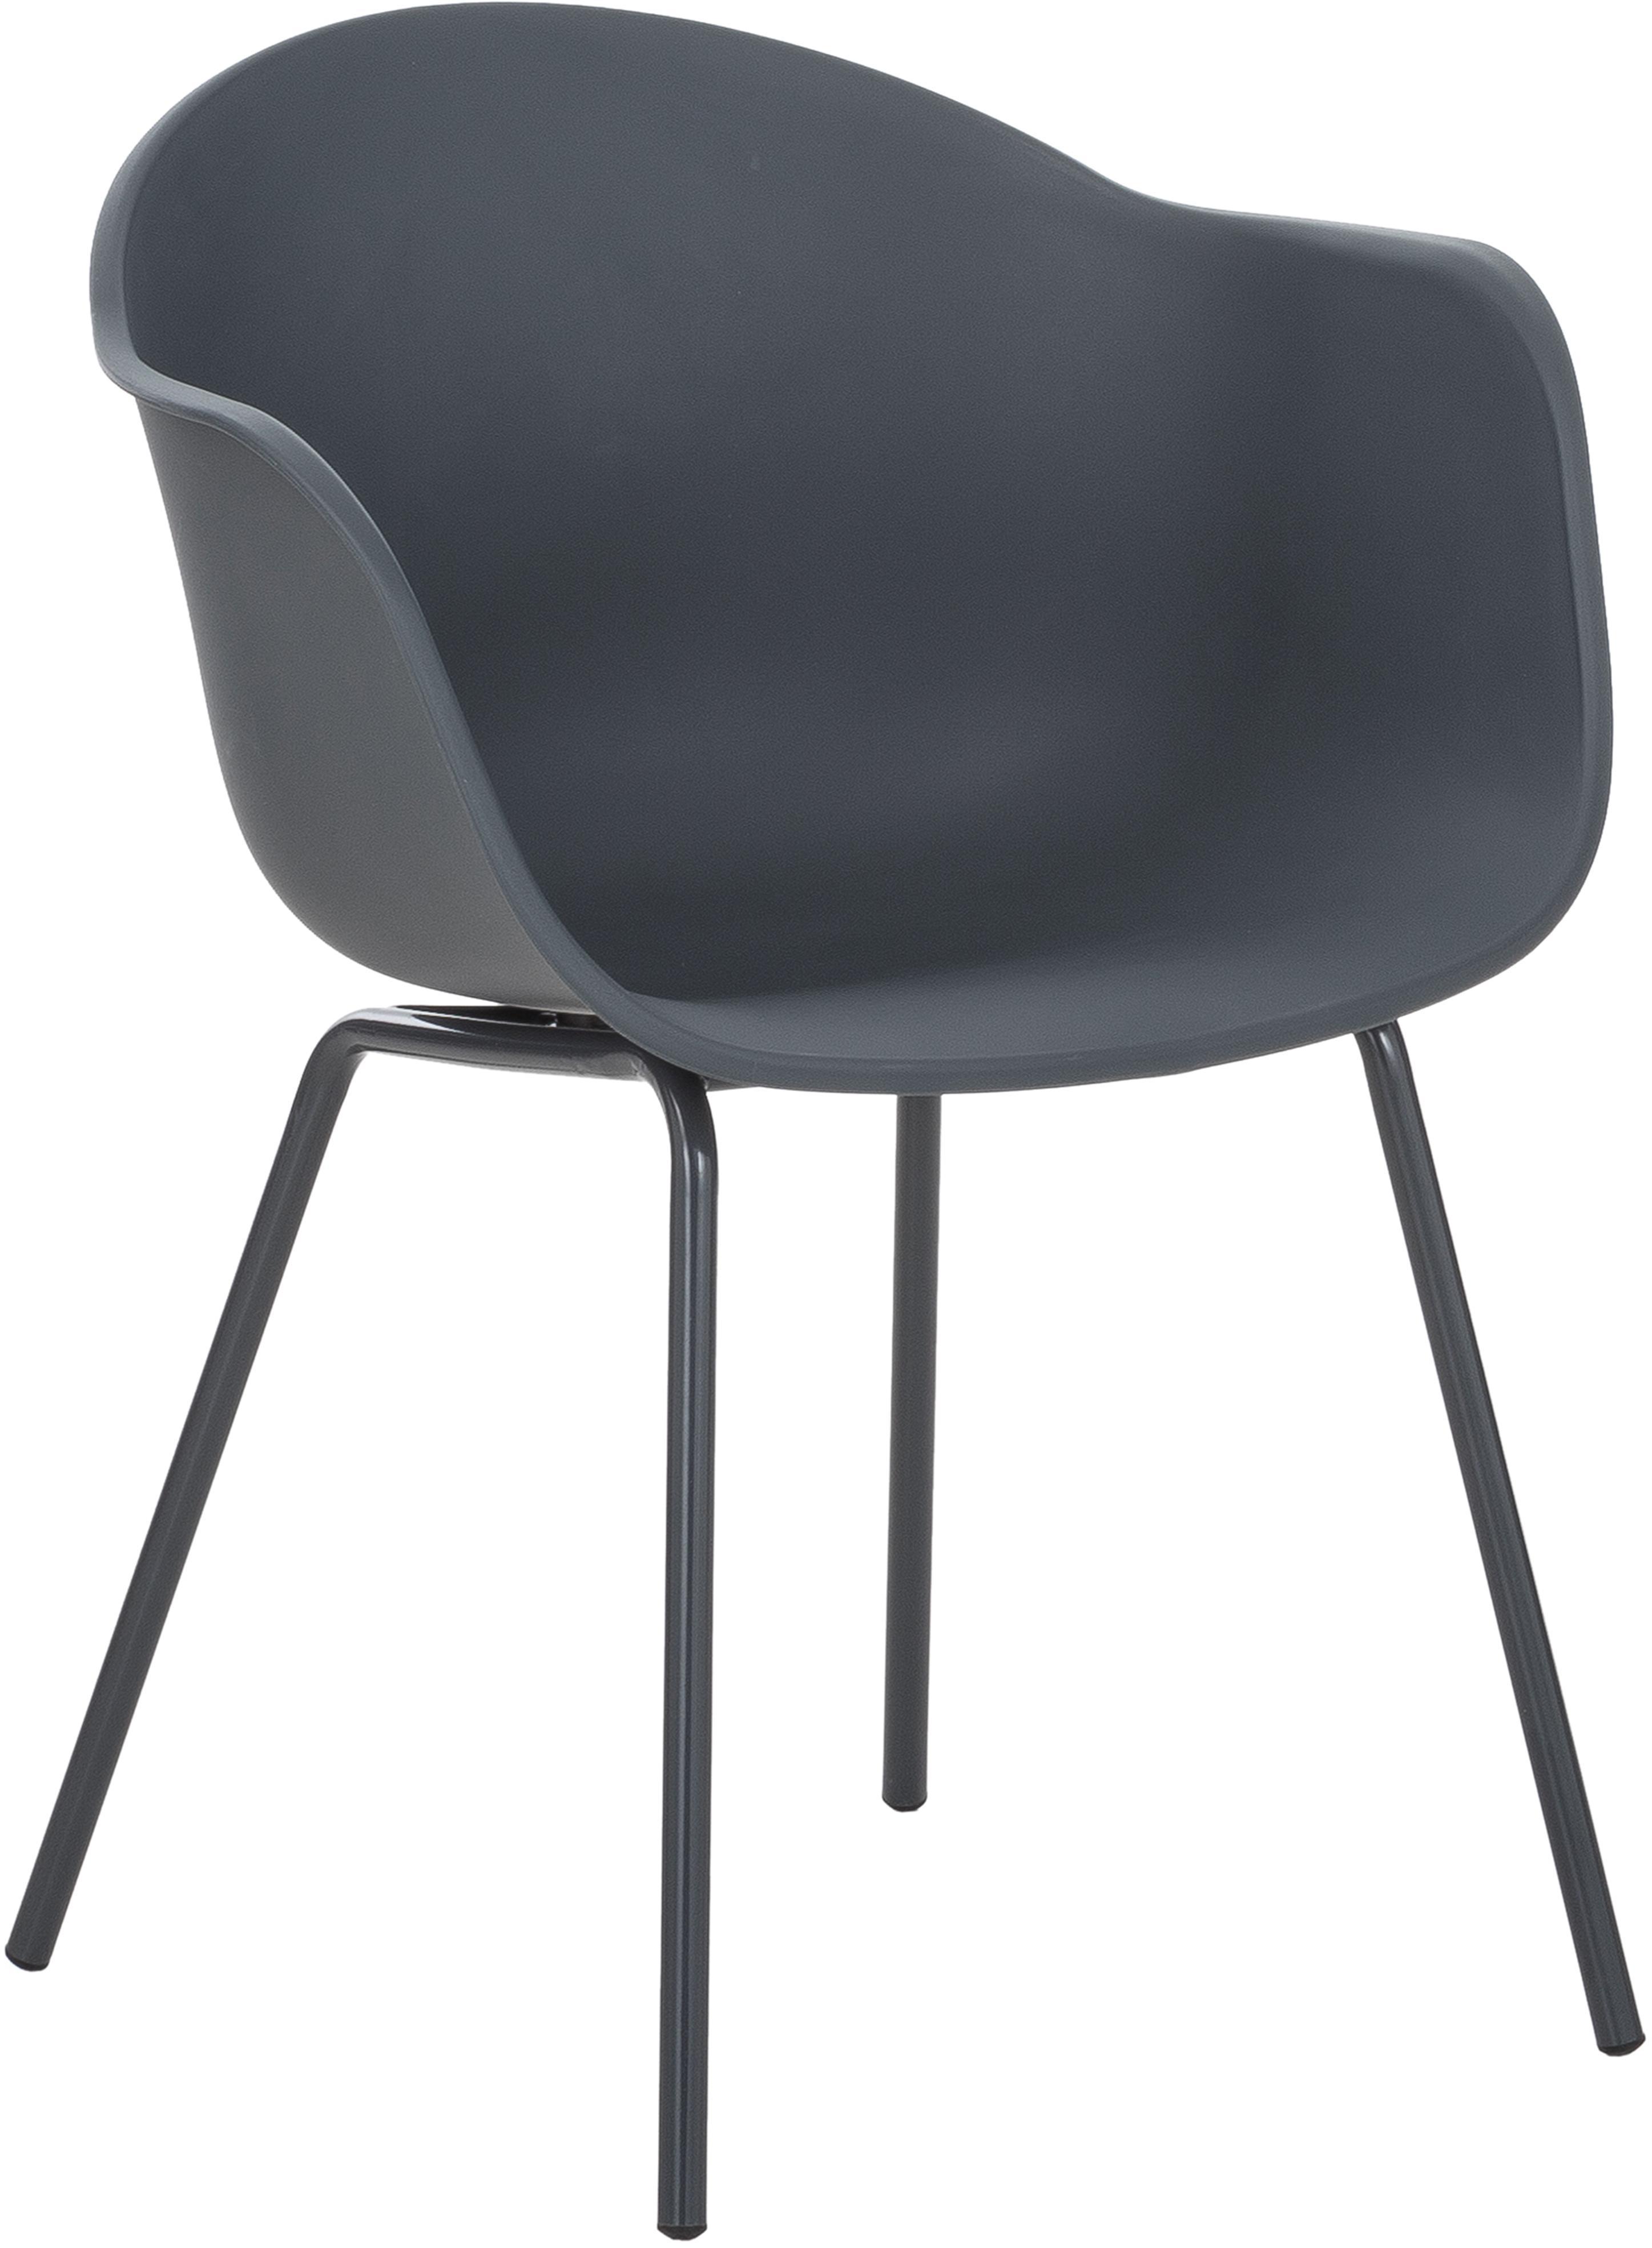 Silla con reposabrazos Claire, Asiento: plástico, Patas: metal con pintura en polv, Gris, An 54 x F 60 cm